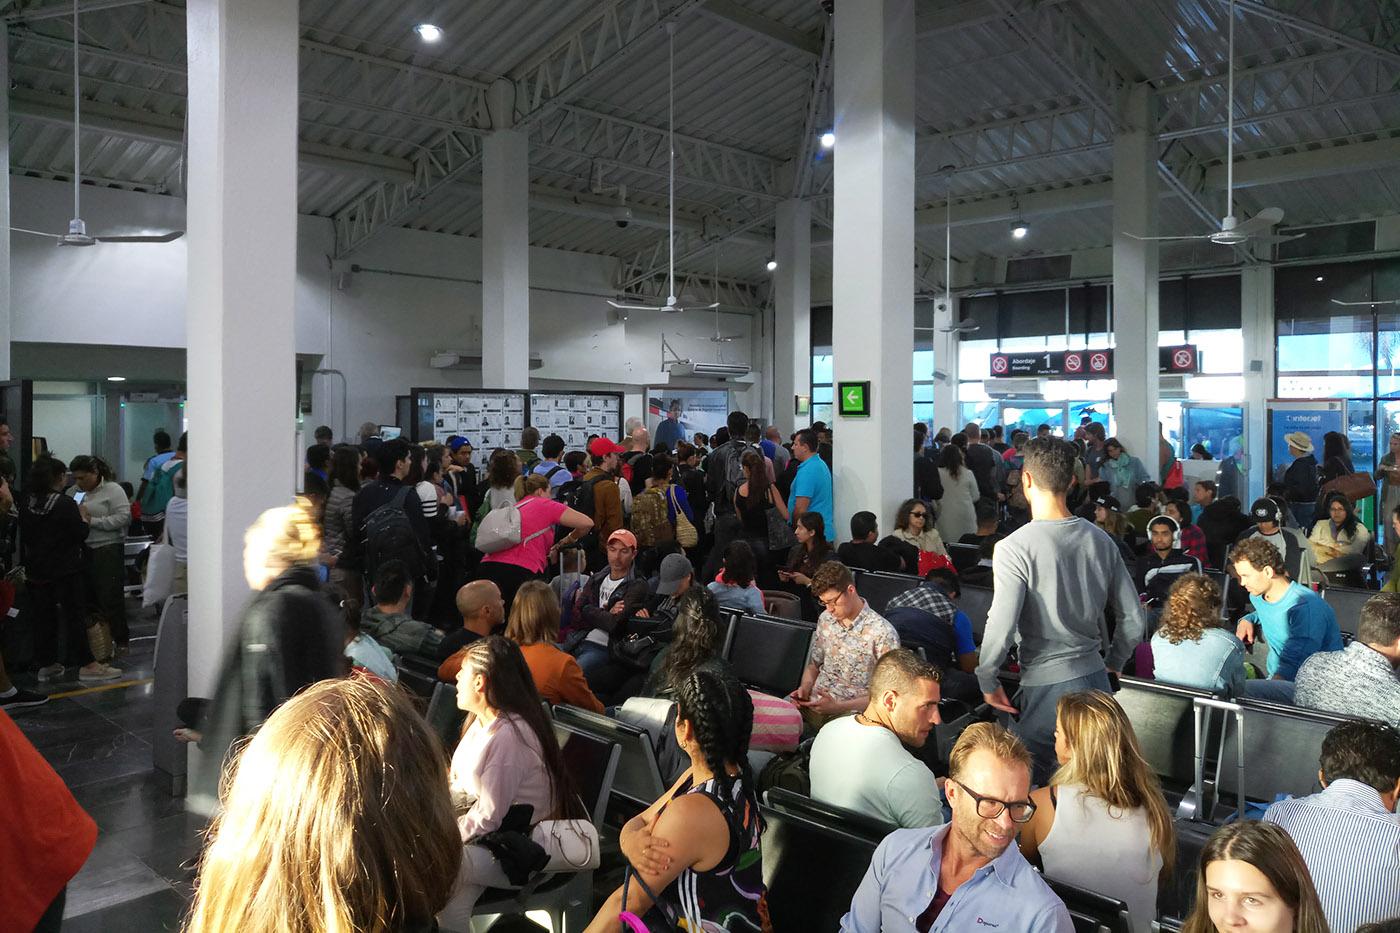 inside puerto escondido airport waiting area